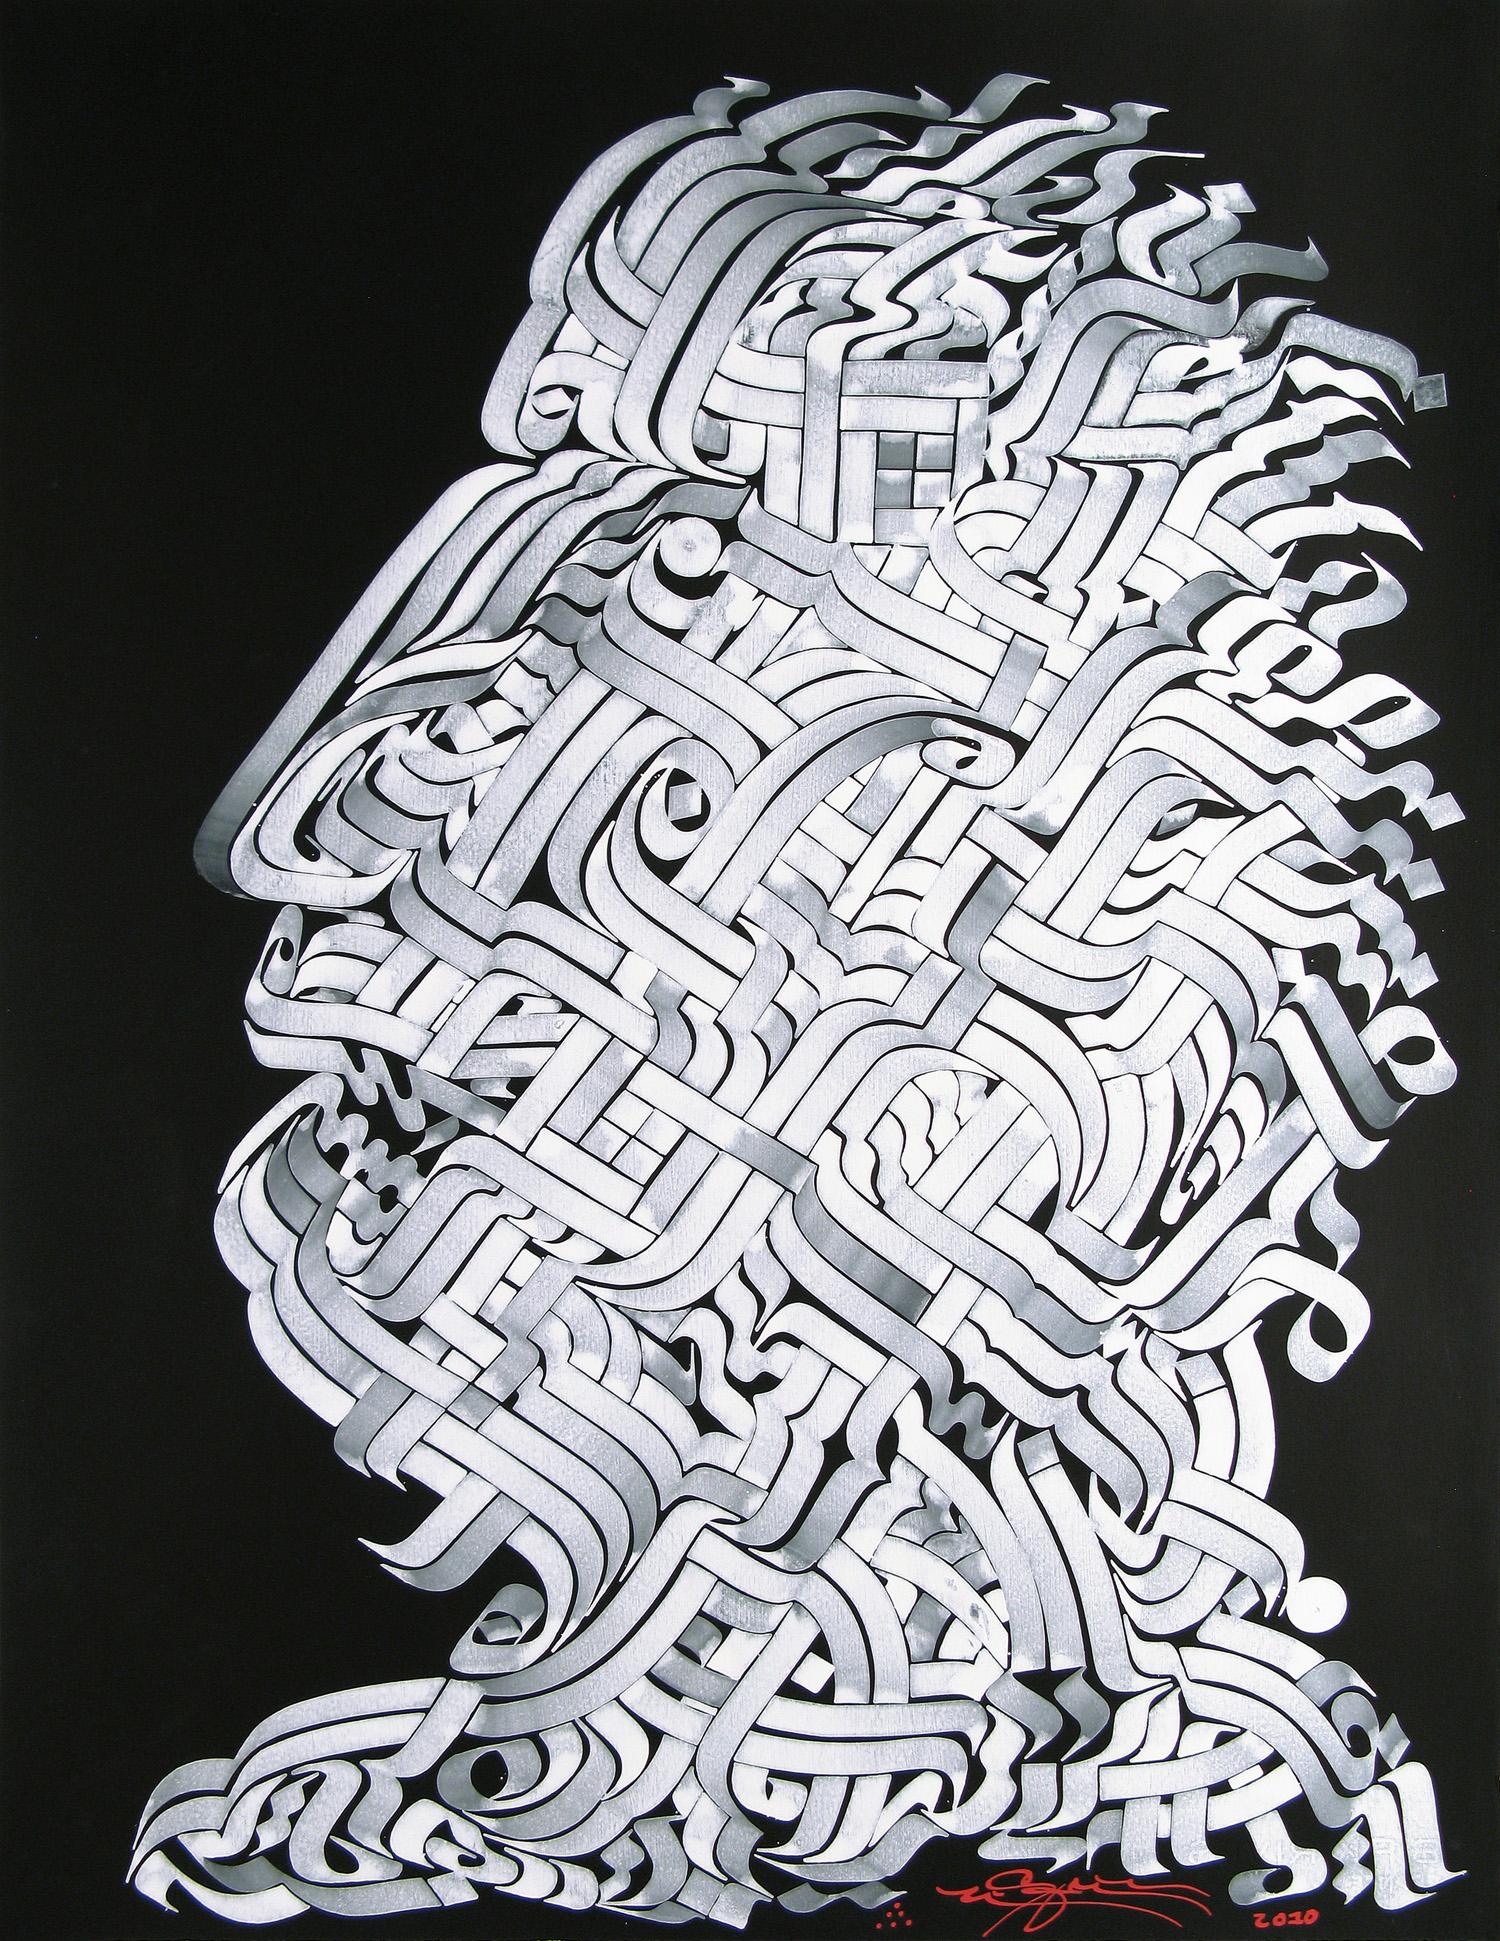 Arkology III, 2010 ink and acrylic on paper 0 x 22 inch